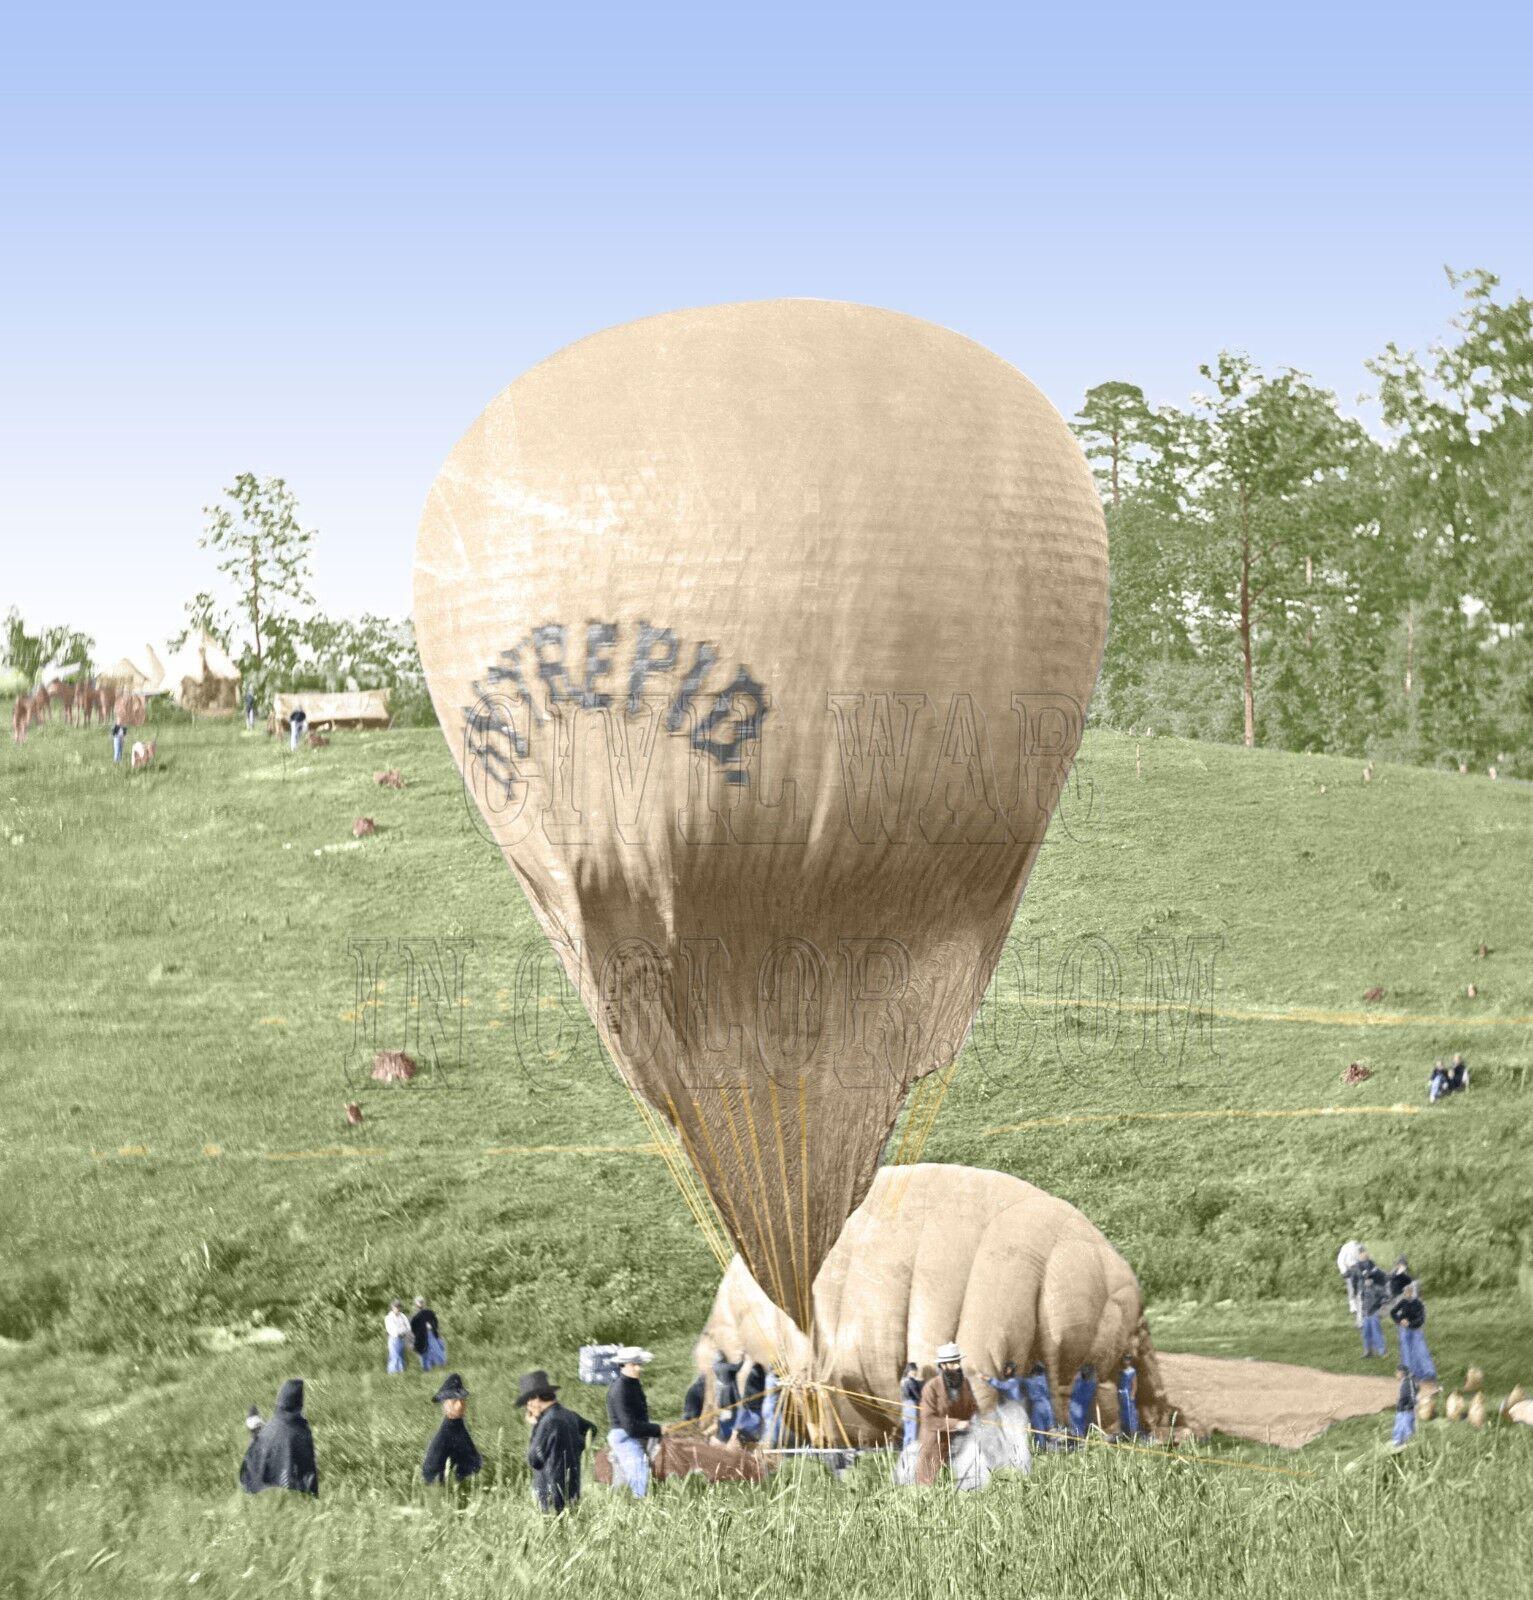 Balloon Professor Lowe Intrepid Constitution Farbe Tinted photo Civil War 01563